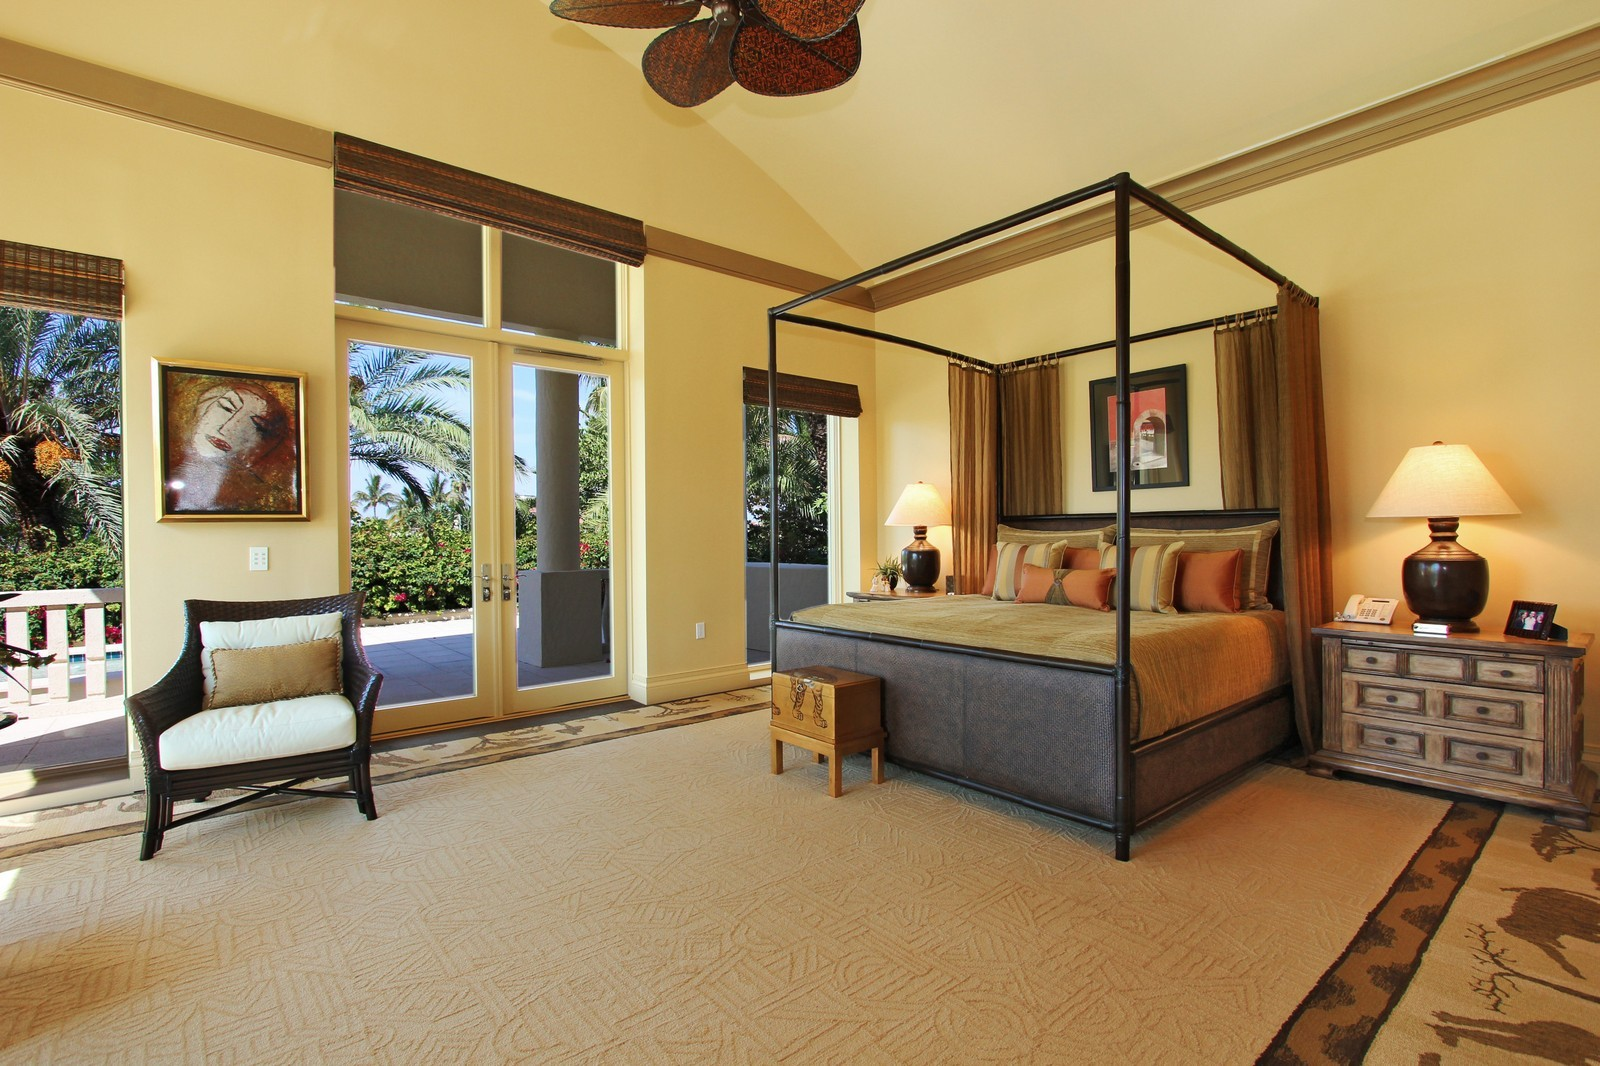 Real Estate Photography - 6814 SE Isle Way, Stuart, FL, 34996 - Master Bedroom 1